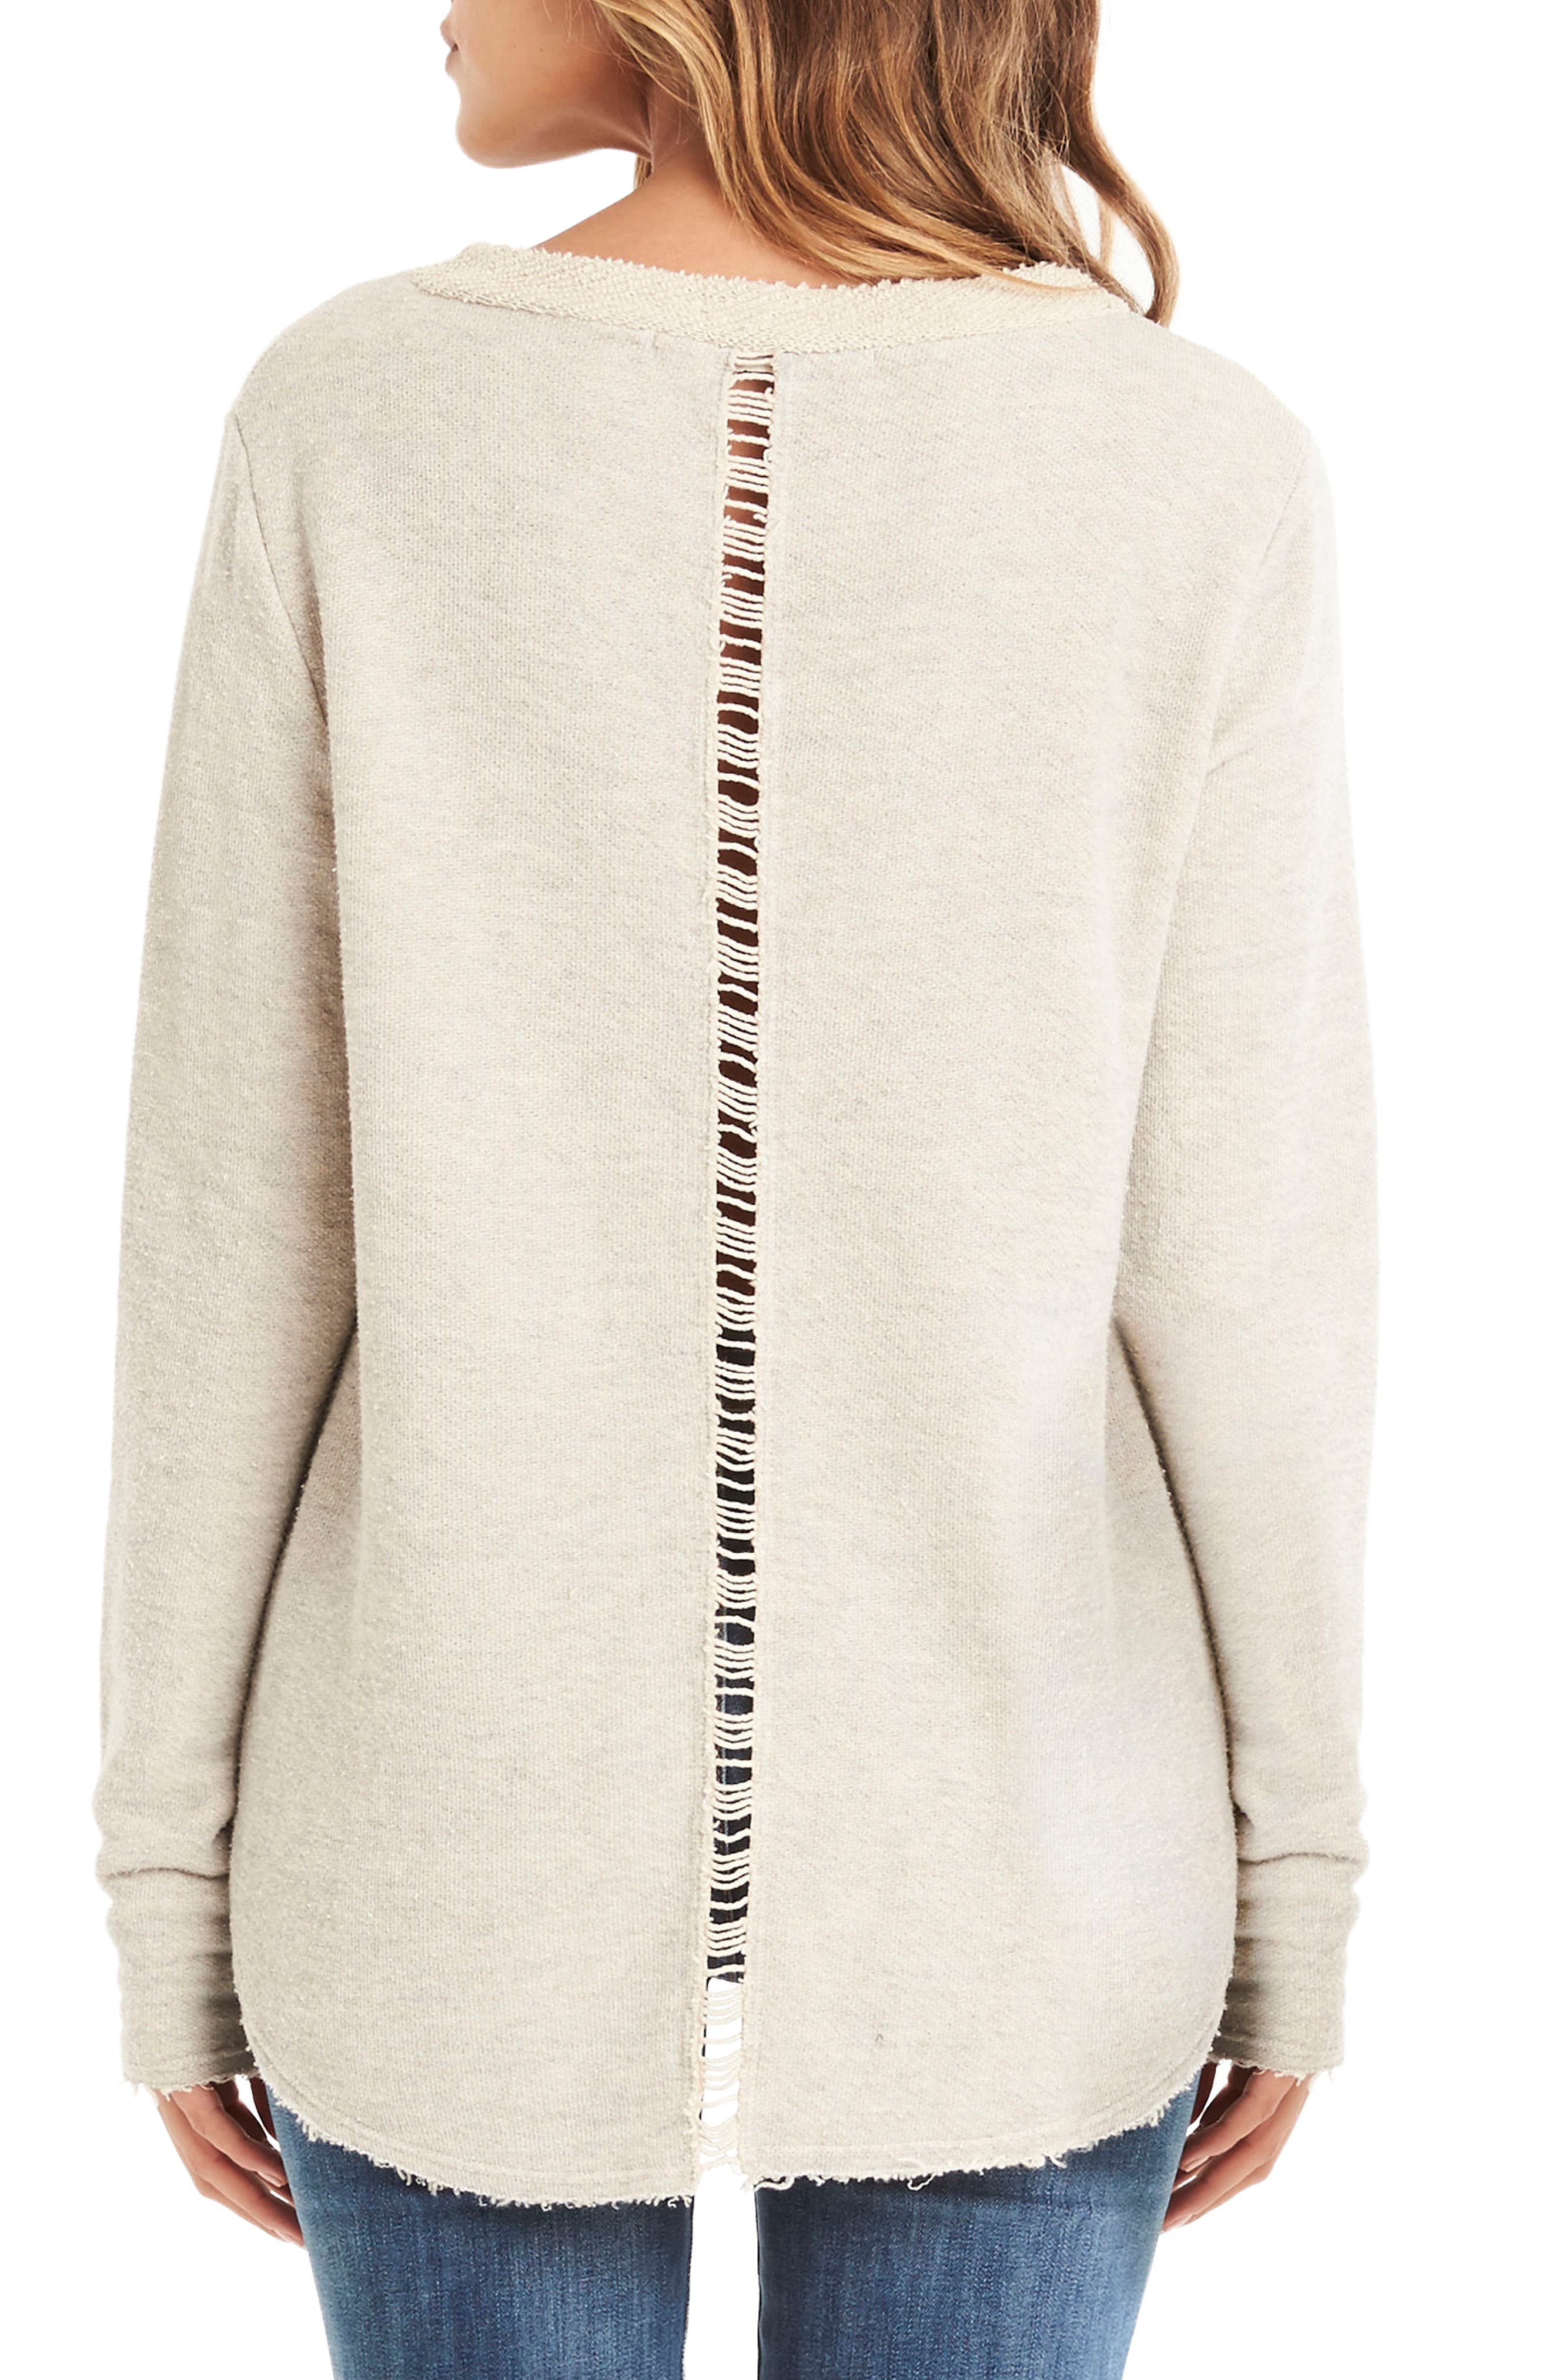 Distressed Sweatshirt,                             Alternate thumbnail 2, color,                             Chalk